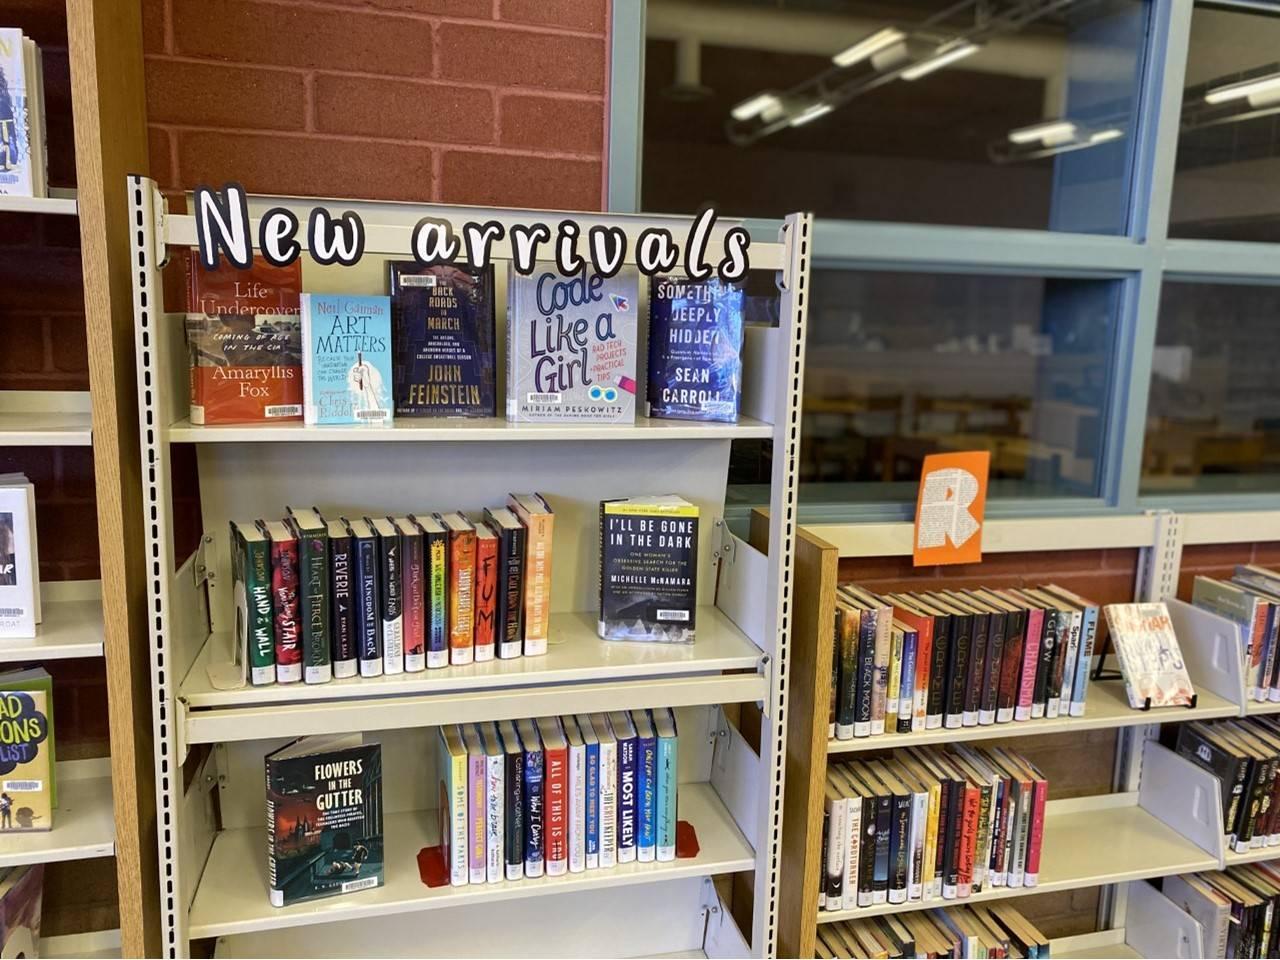 CG-Library20201105 (2)